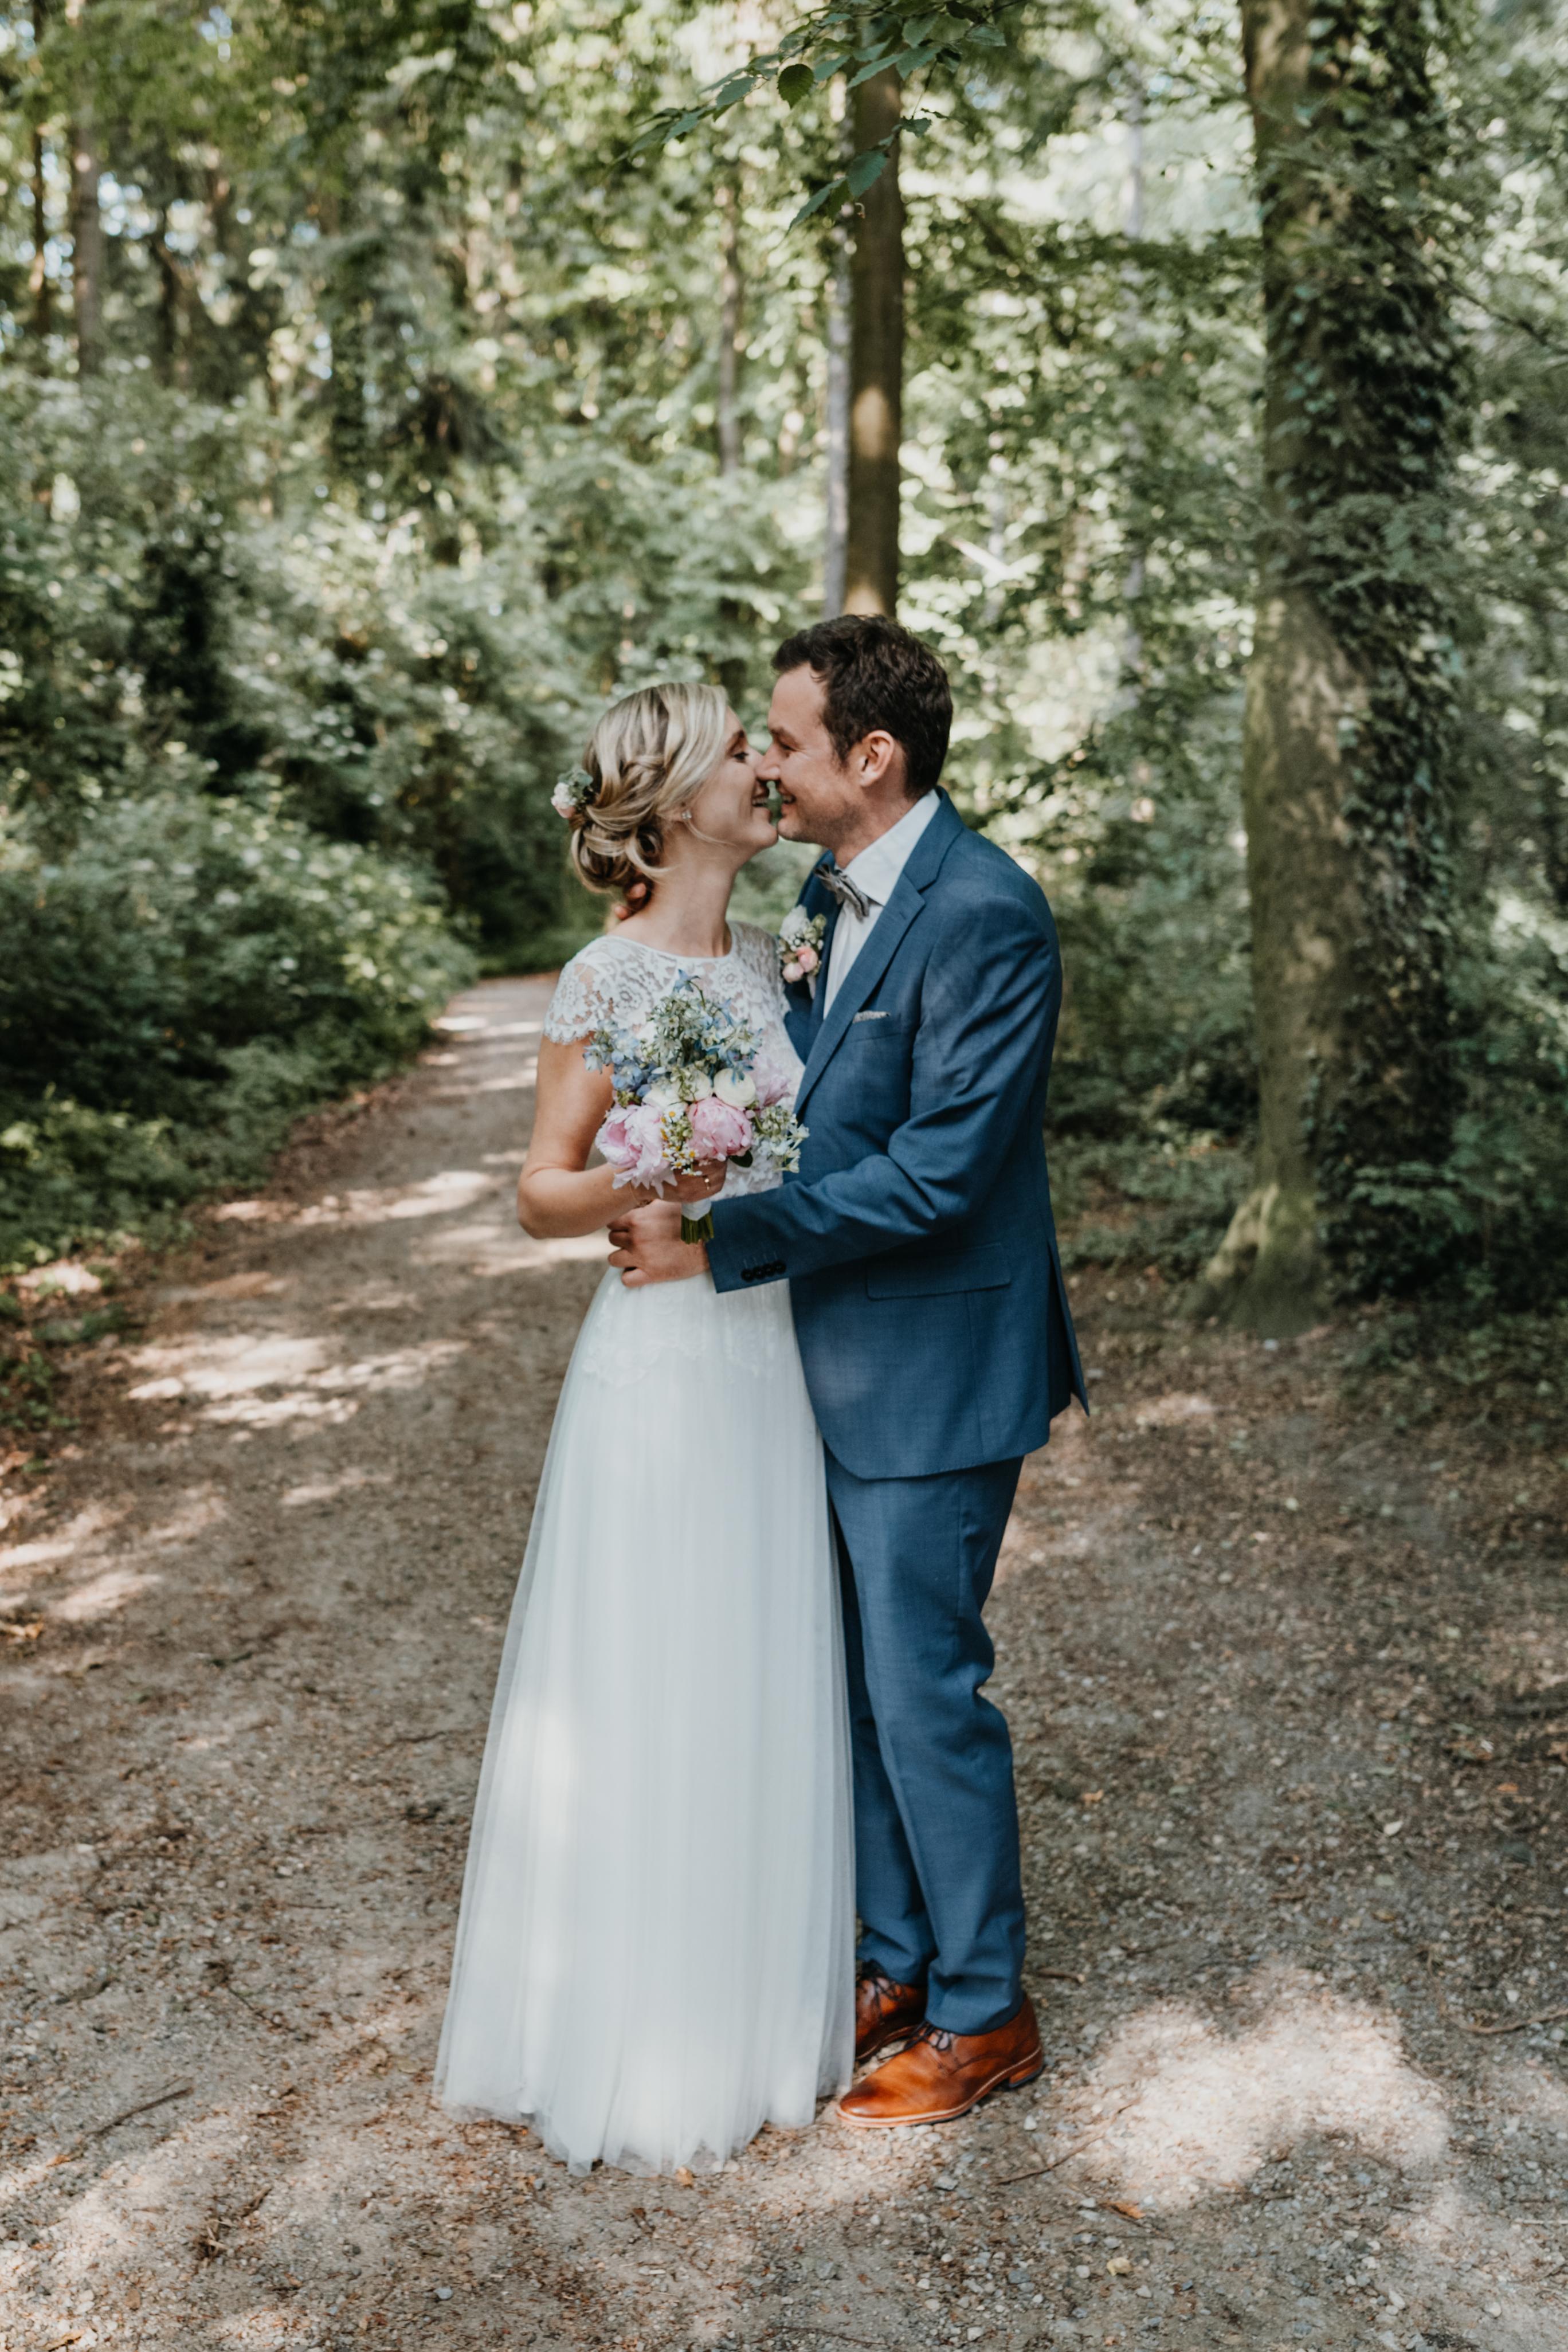 Lua_Pauline_Aachen_Hochzeitsfotograf